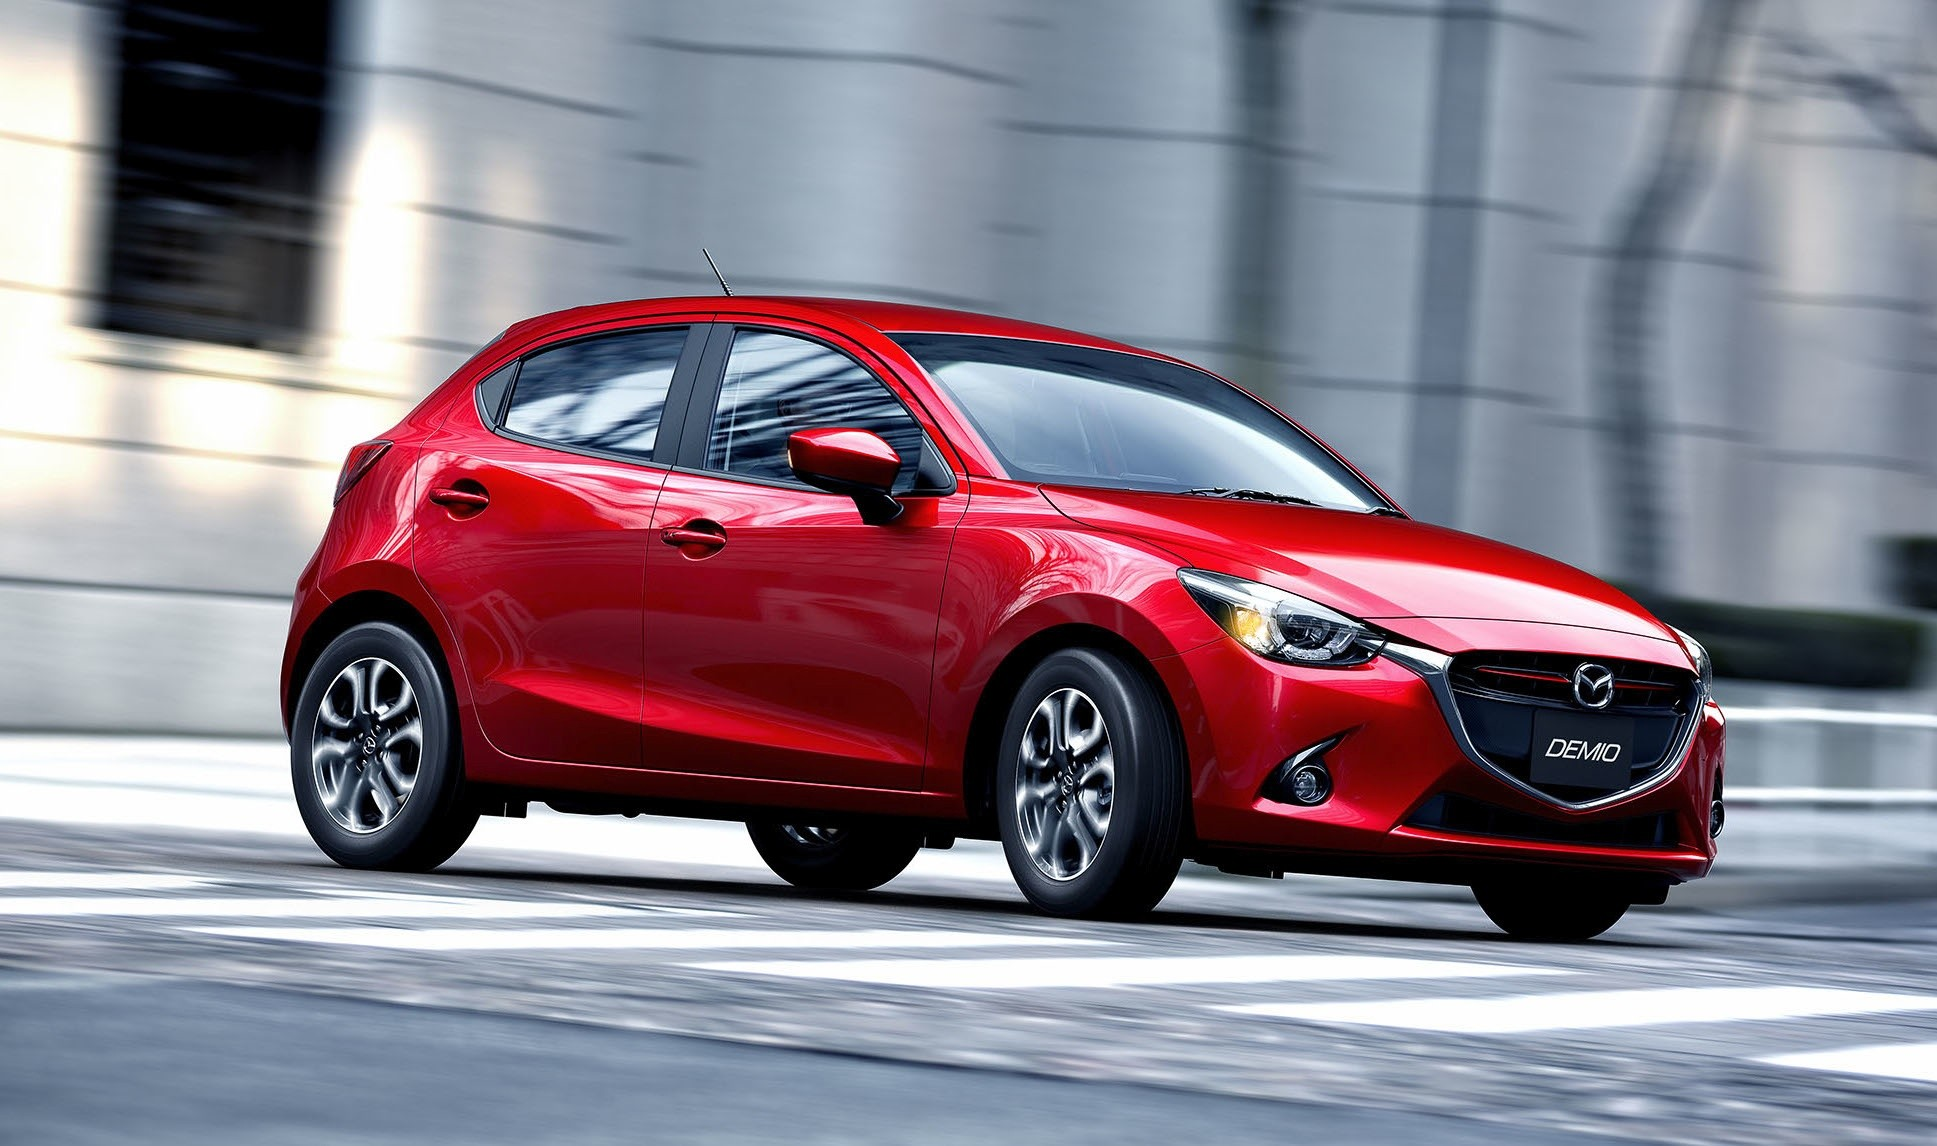 Mazda намерена отказаться от участия в Парижском автосалоне